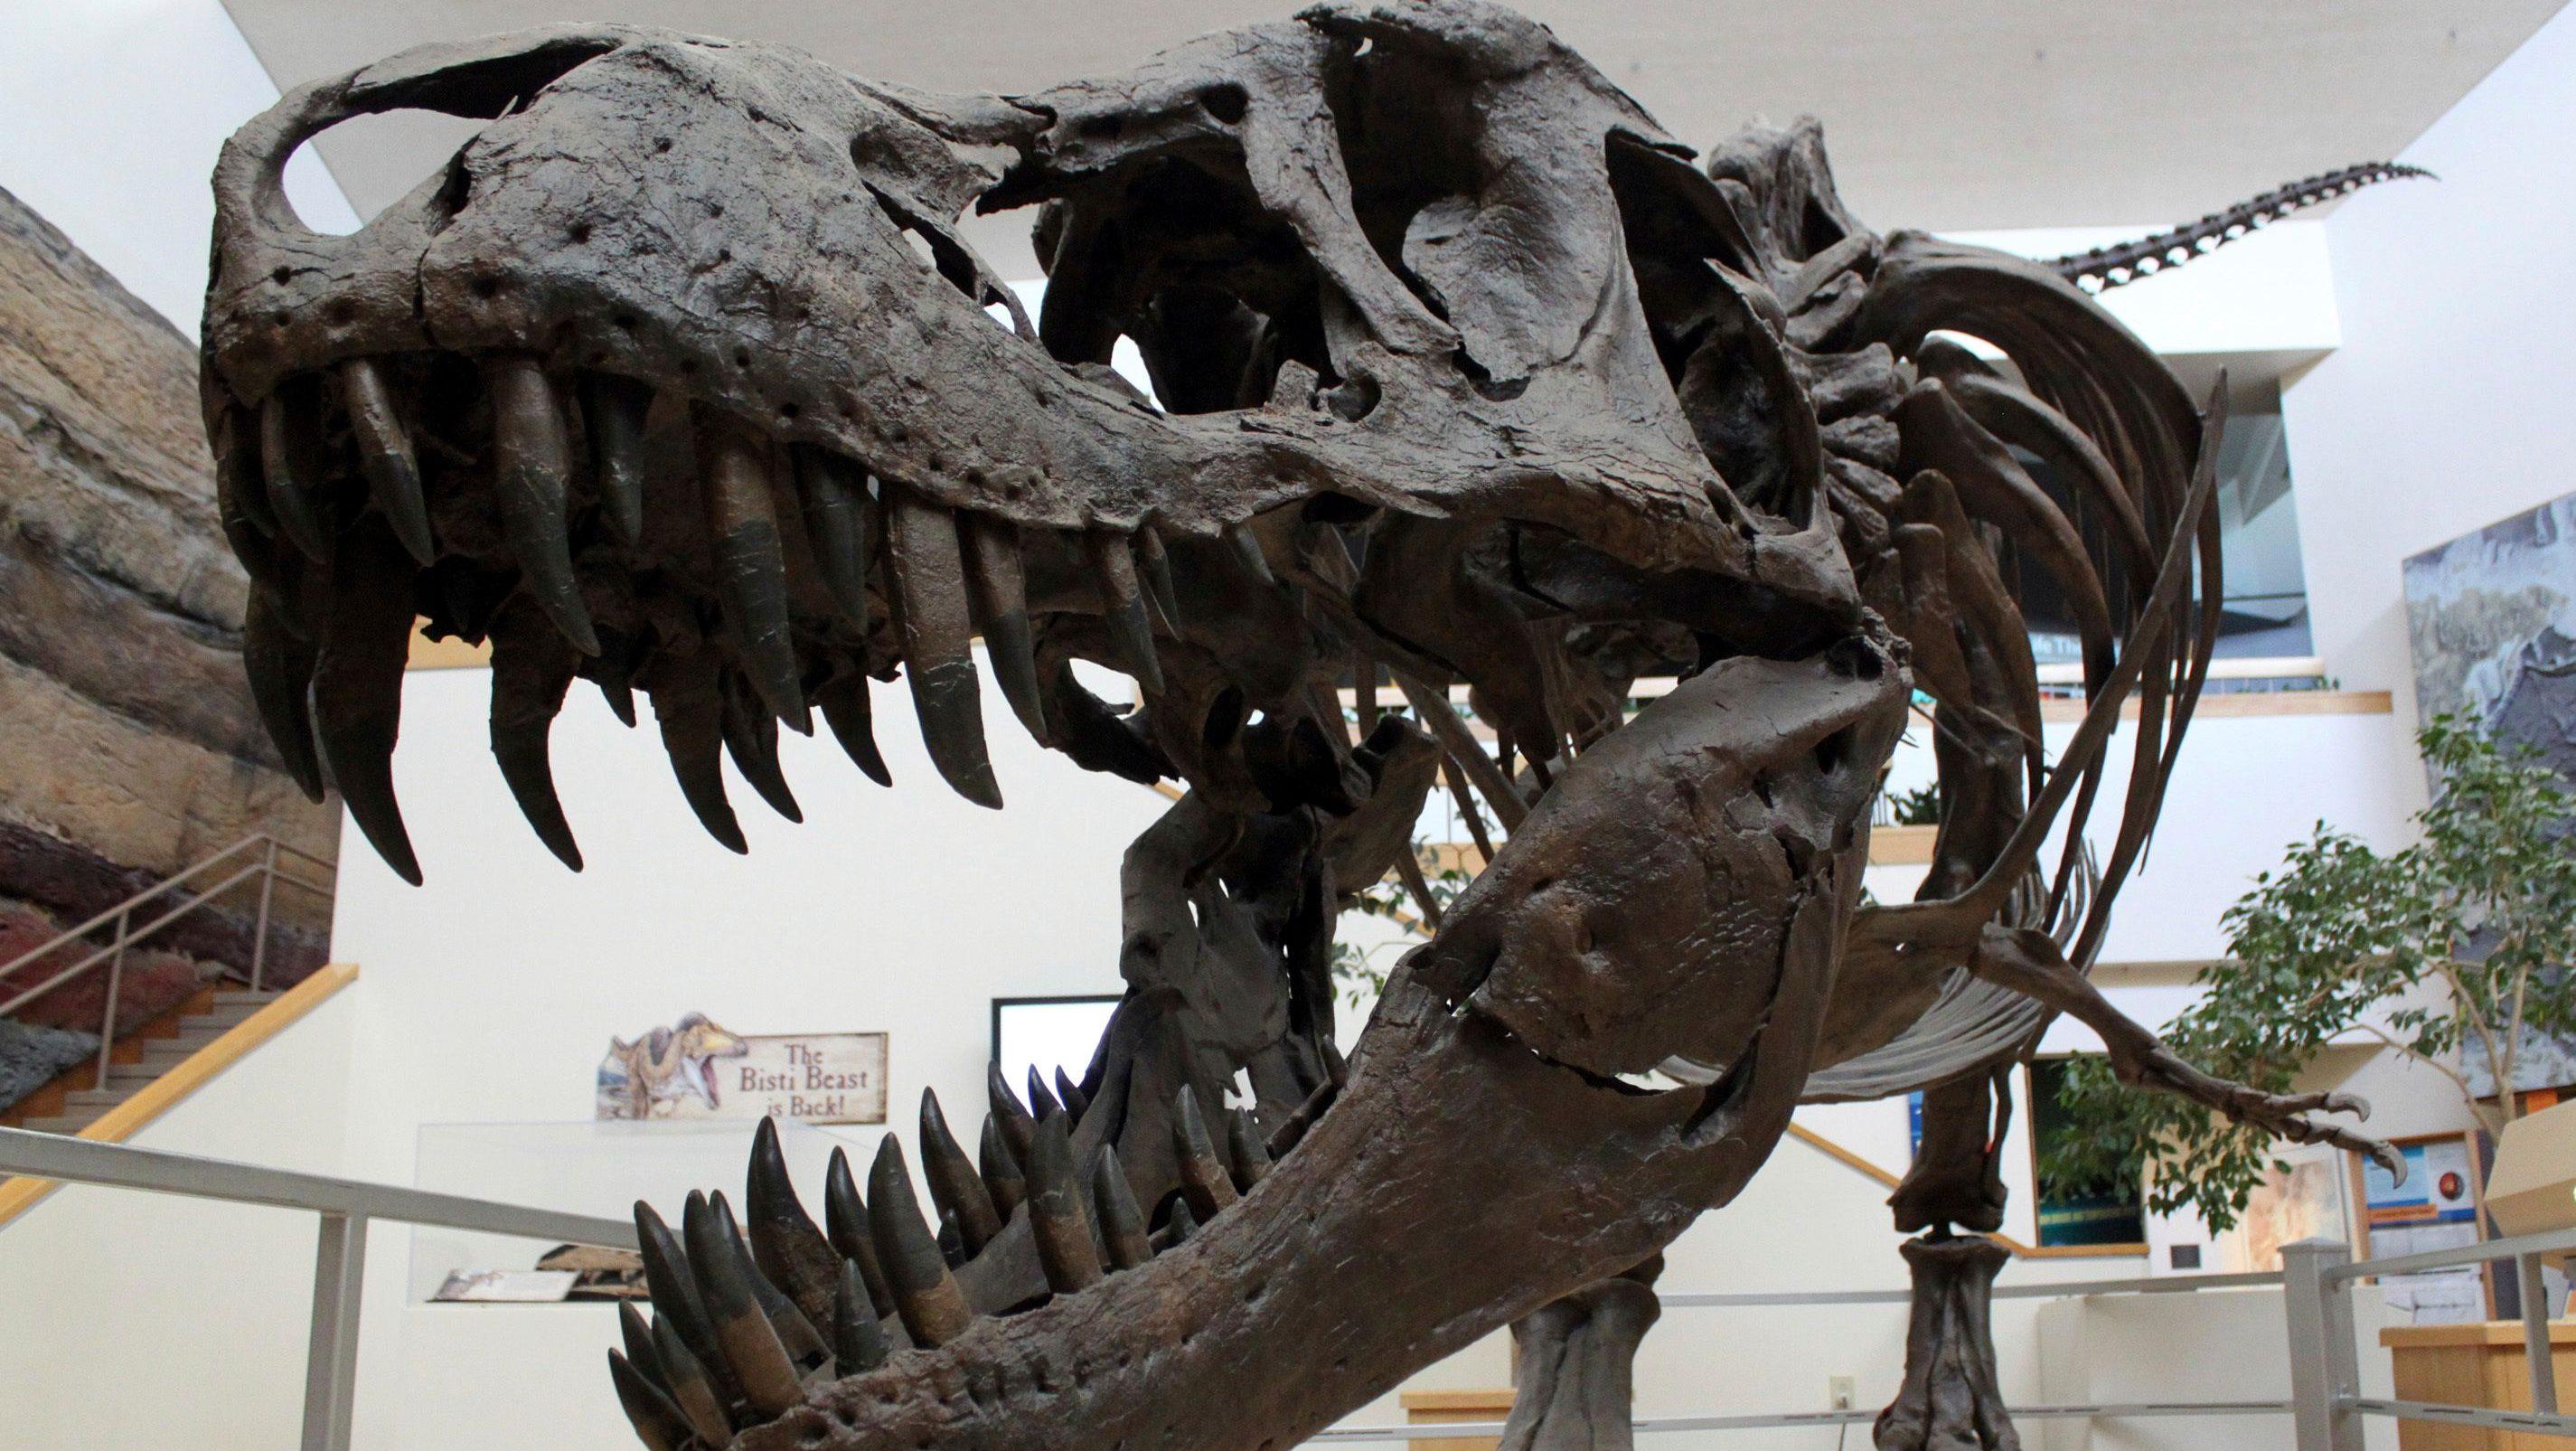 armeria Quartiere Regina  Dinosaur skeleton auctions mean that important fossils are going ...